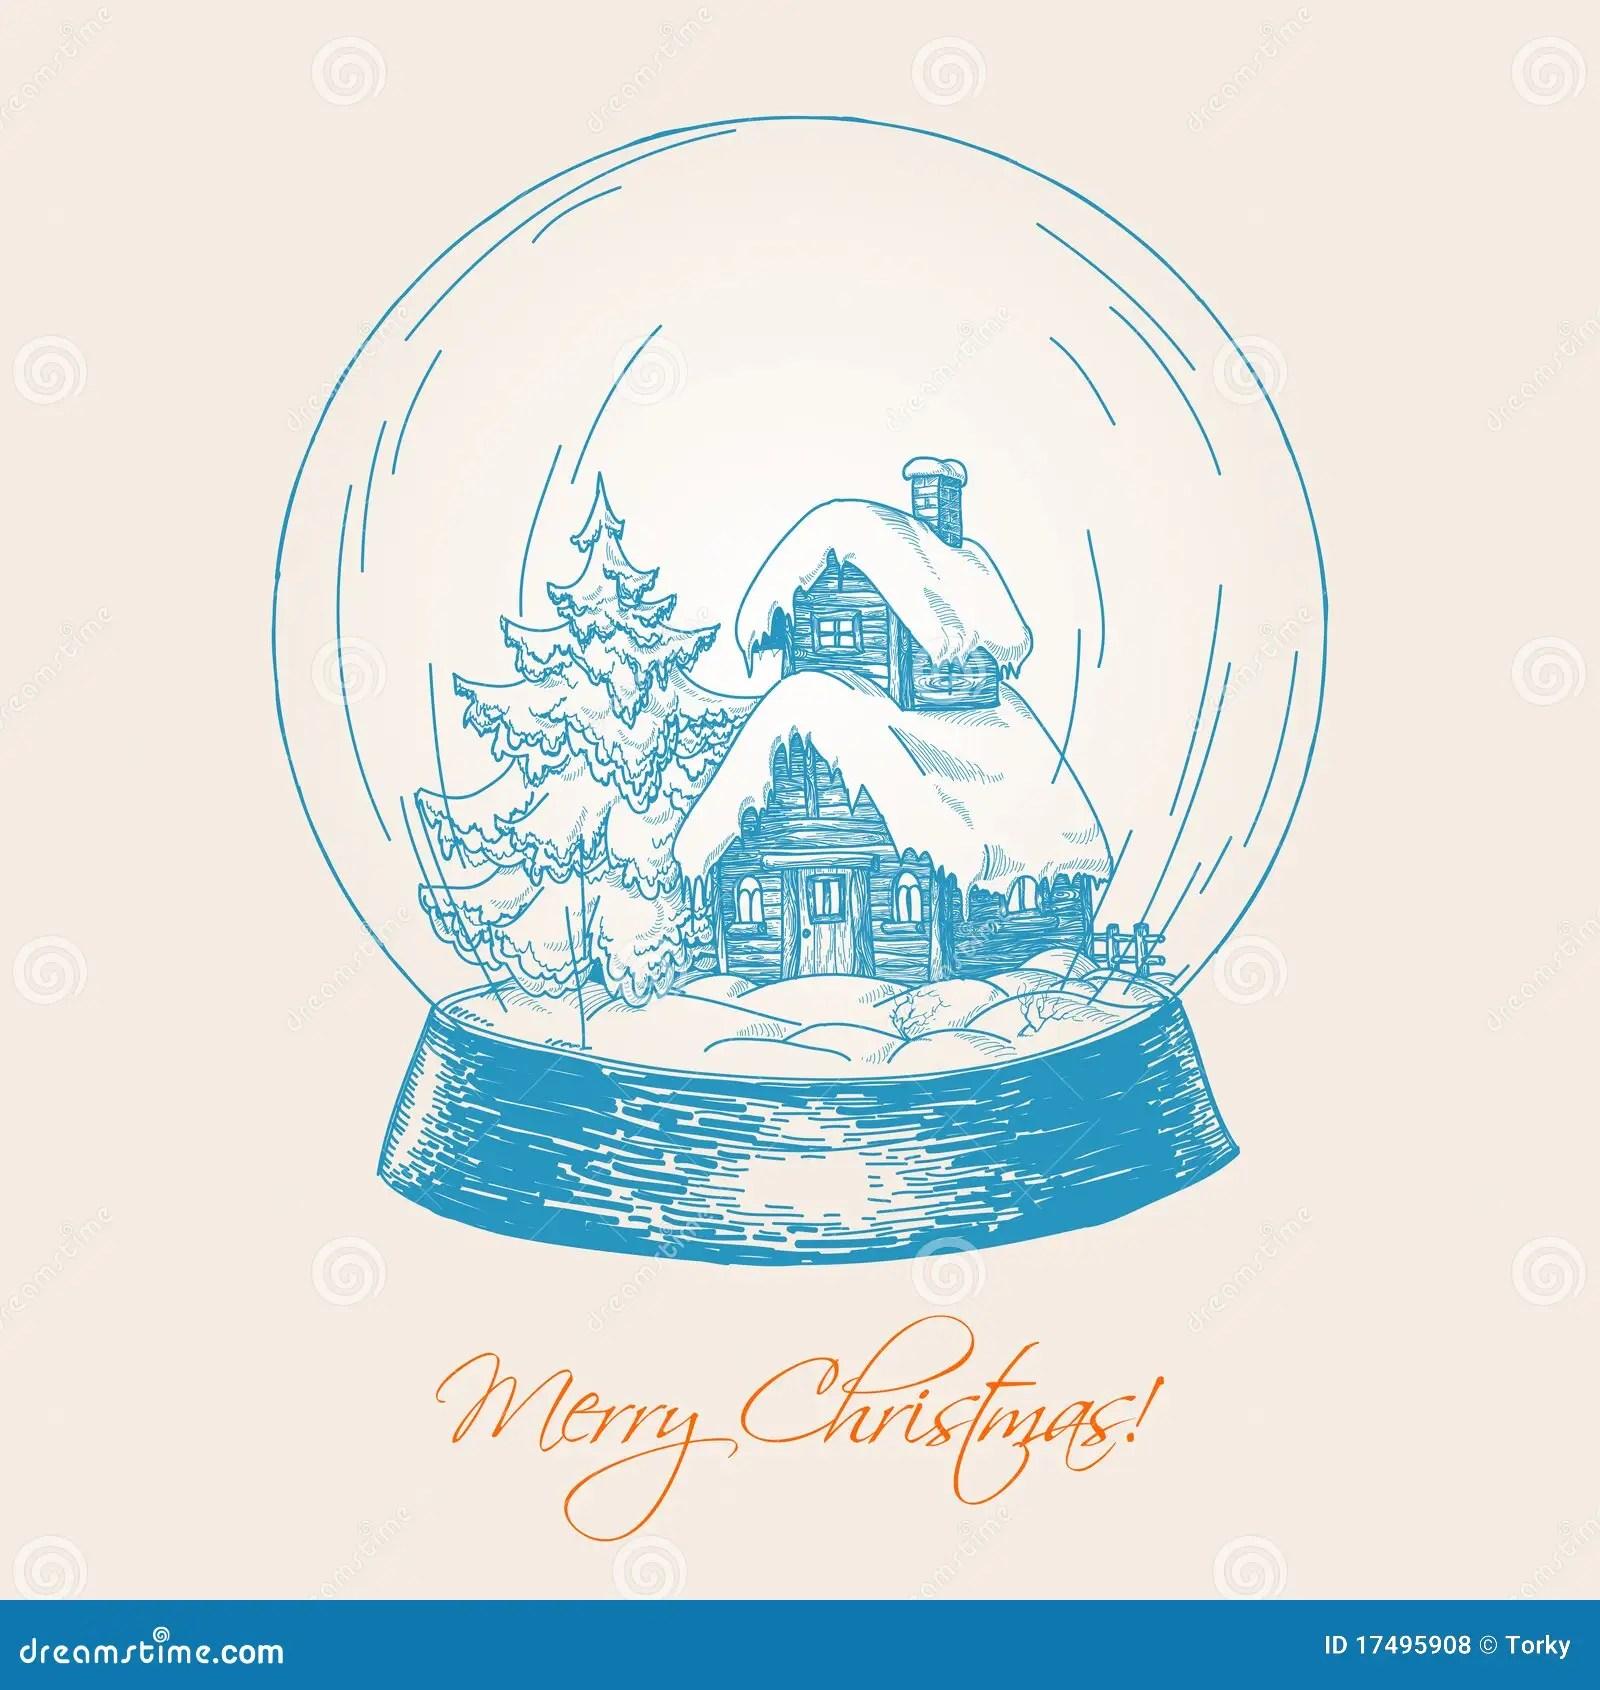 Snow Globe Sketch Royalty Free Stock Photos Image 17495908